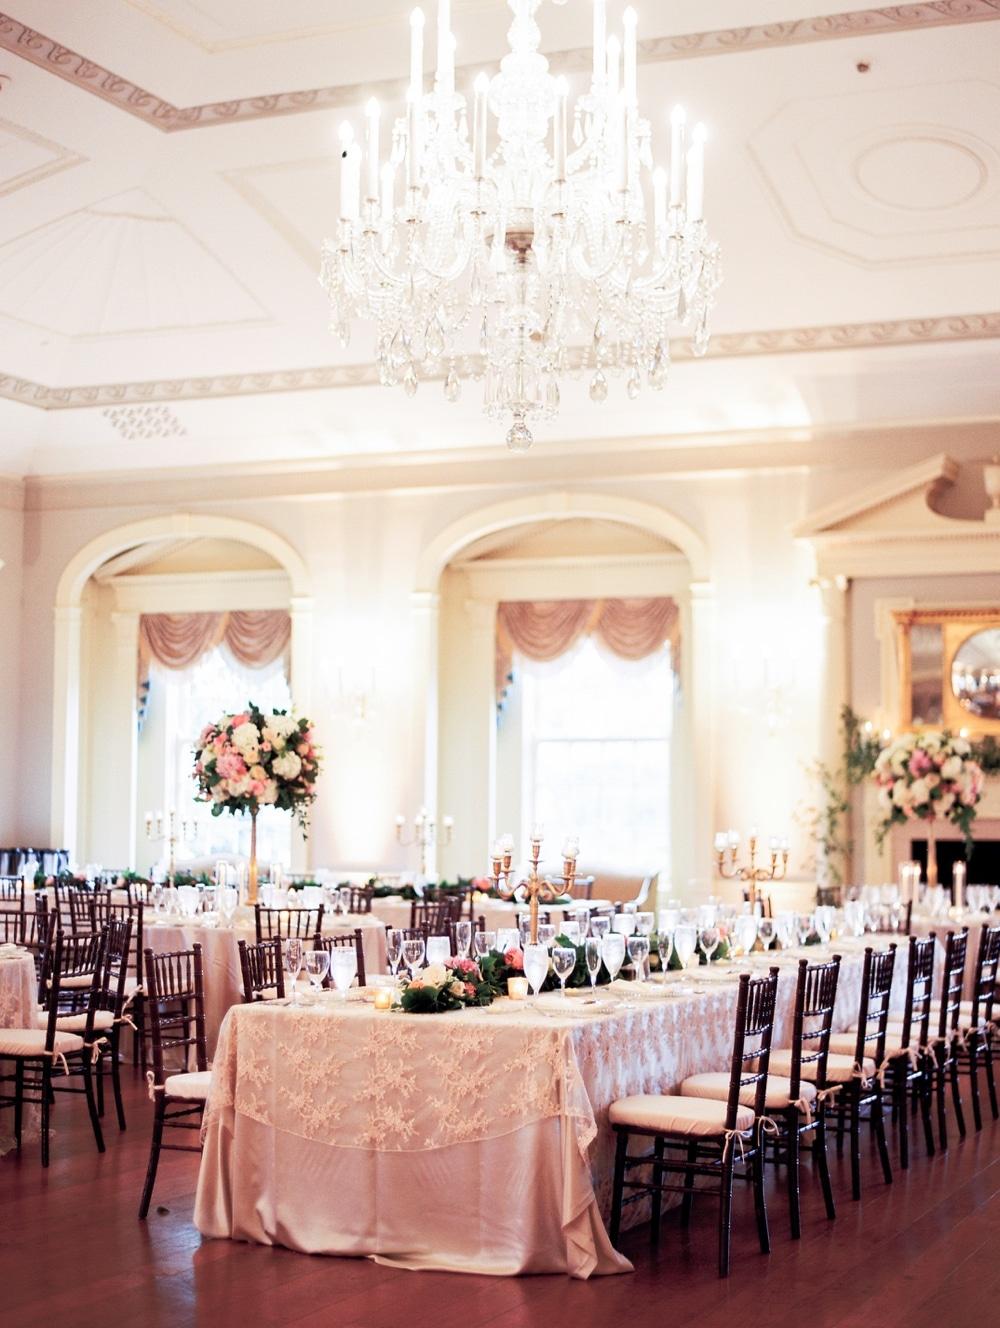 kristin-la-voie-photography-henry-ford-museum-detroit-wedding-photographer-122